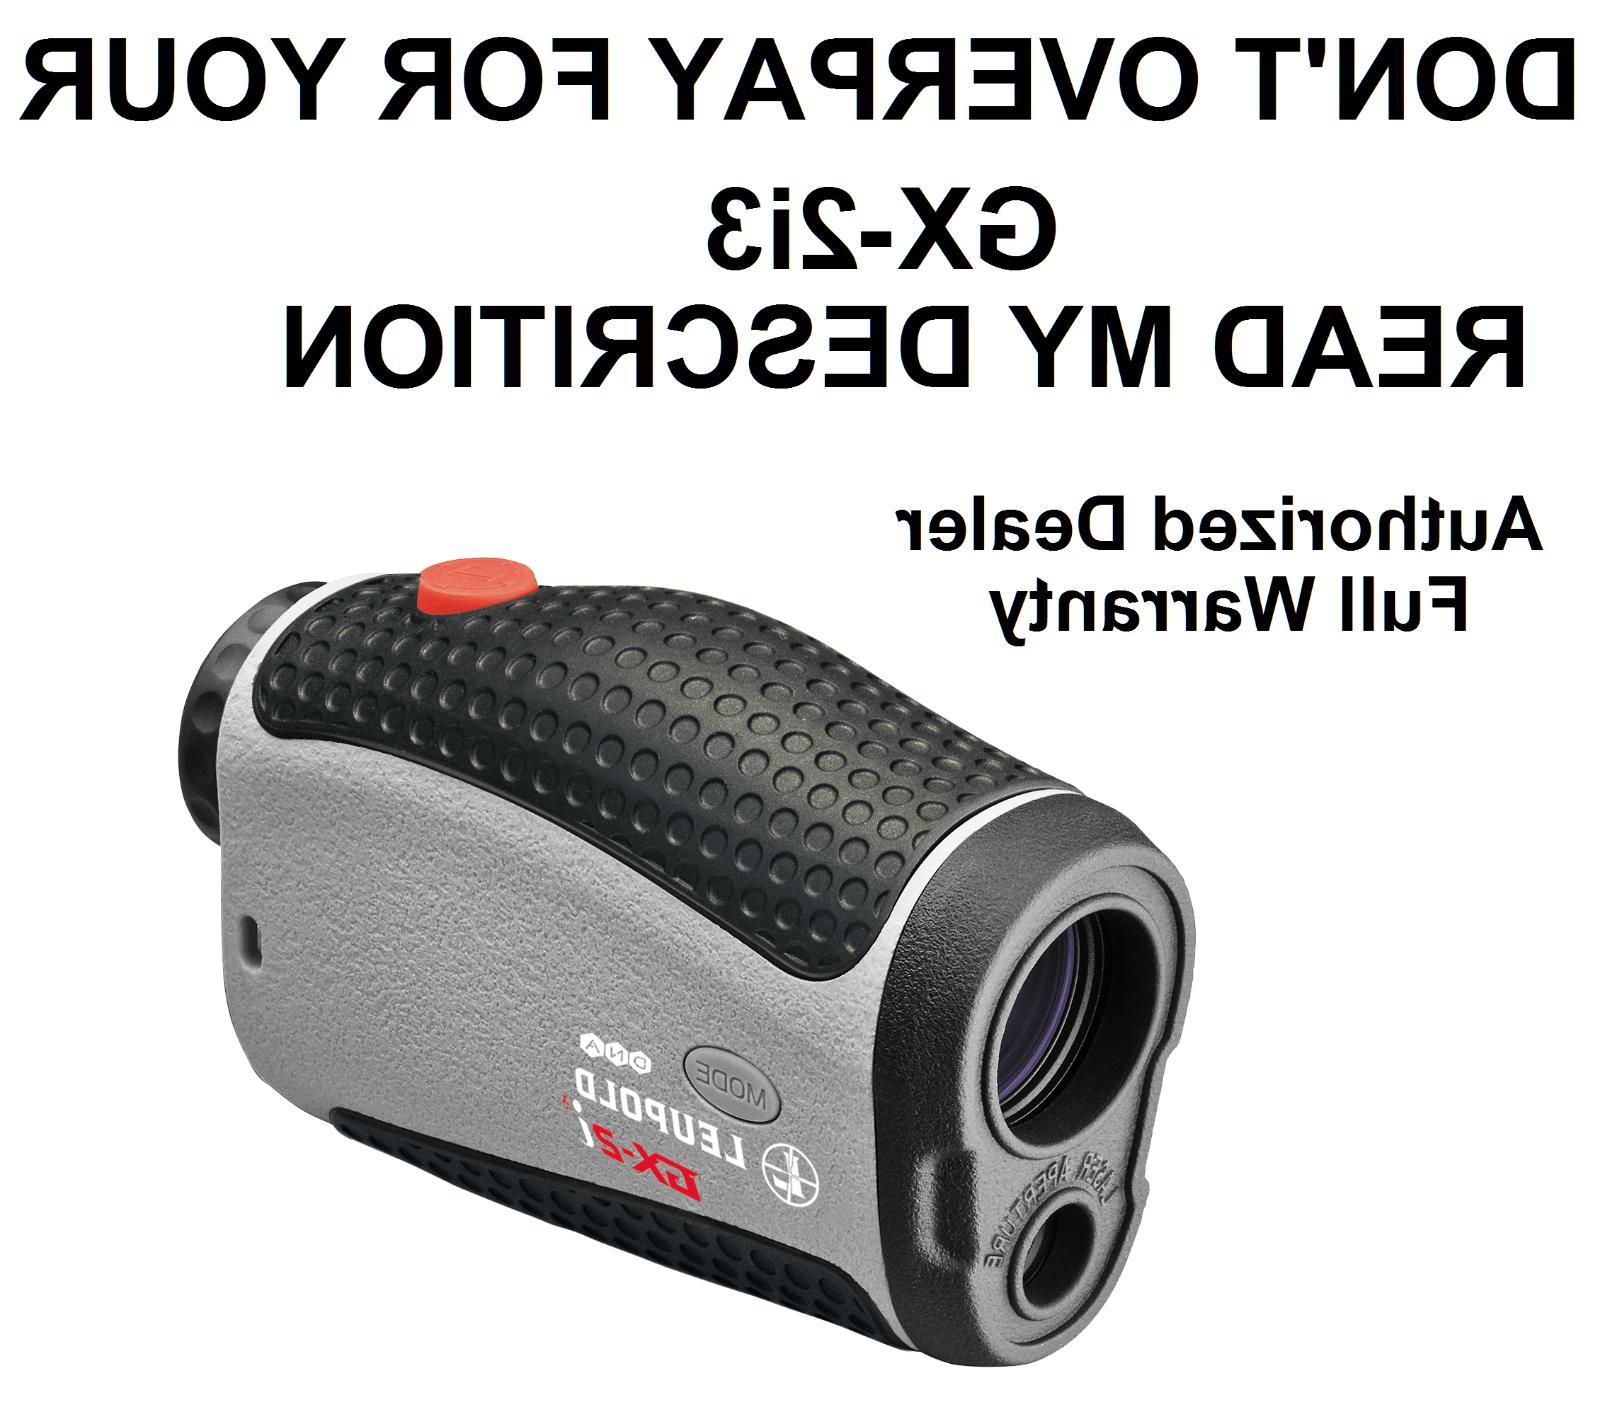 new gx 2i3 golf laser range finder